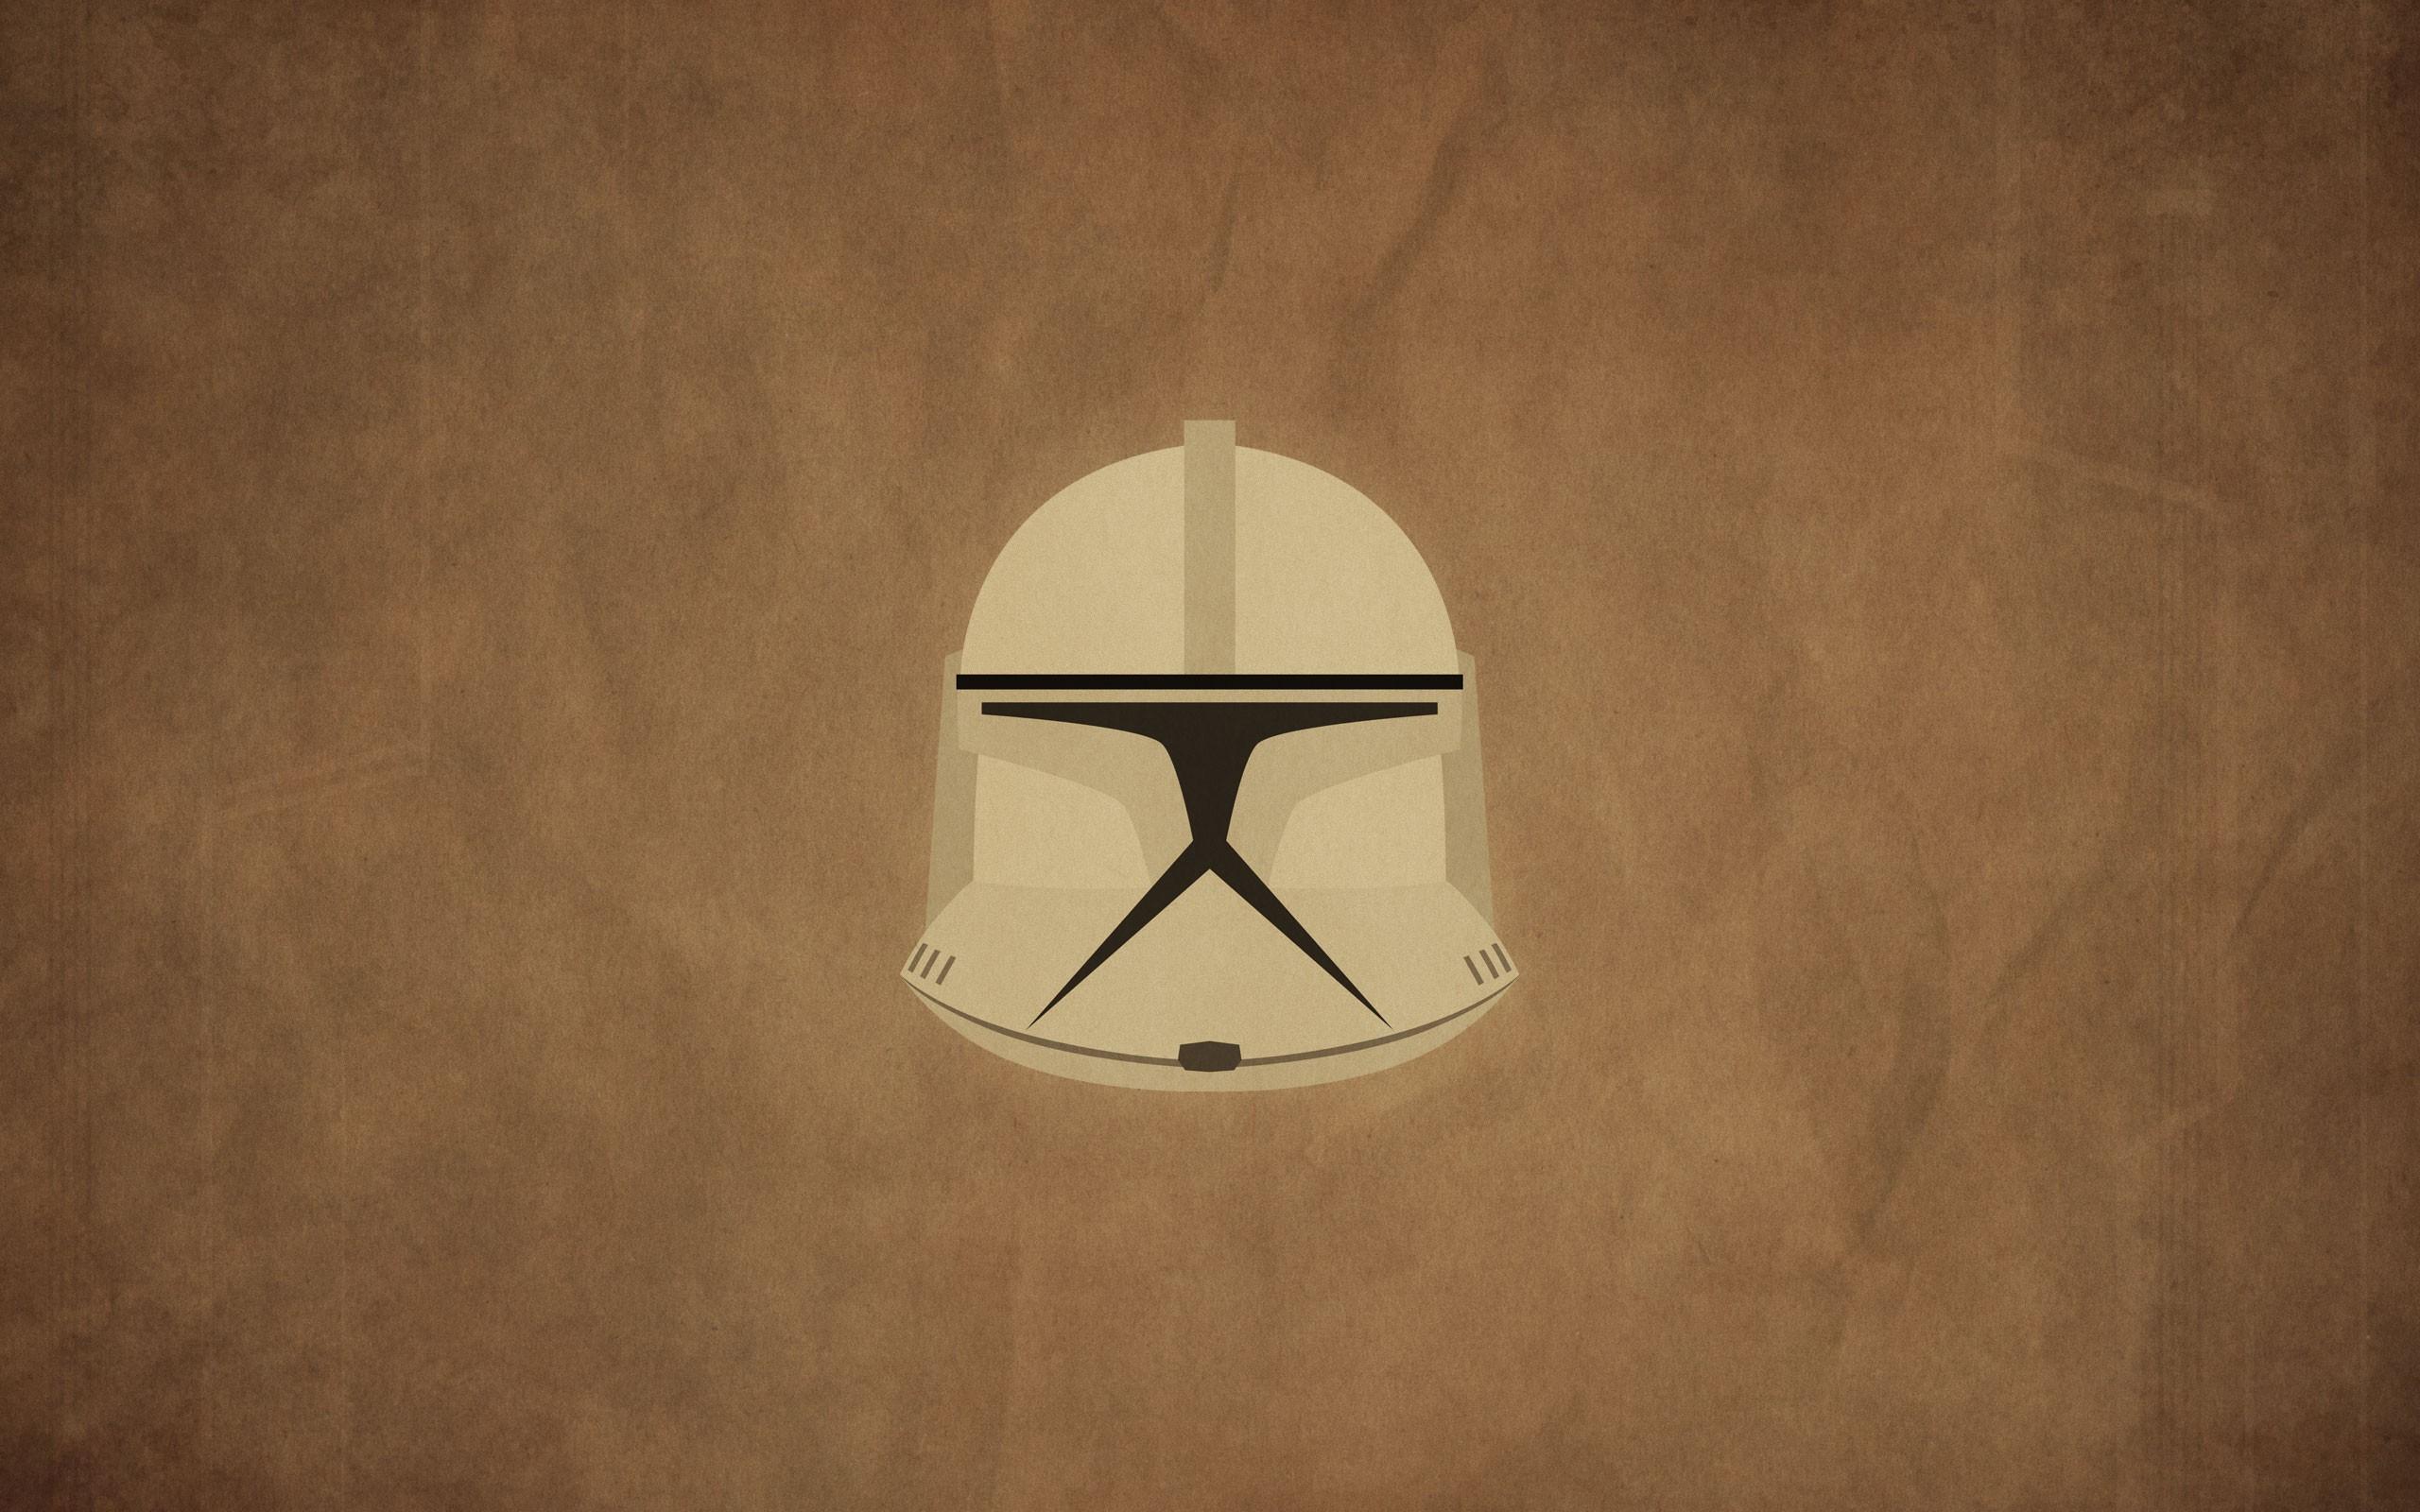 Wallpaper White Black Star Wars Minimalism Wood Movies Logo Symmetry Helmet Science Fiction Circle Brown Background Clone Trooper Shape Number 2560x1600 Noobgurra 238845 Hd Wallpapers Wallhere